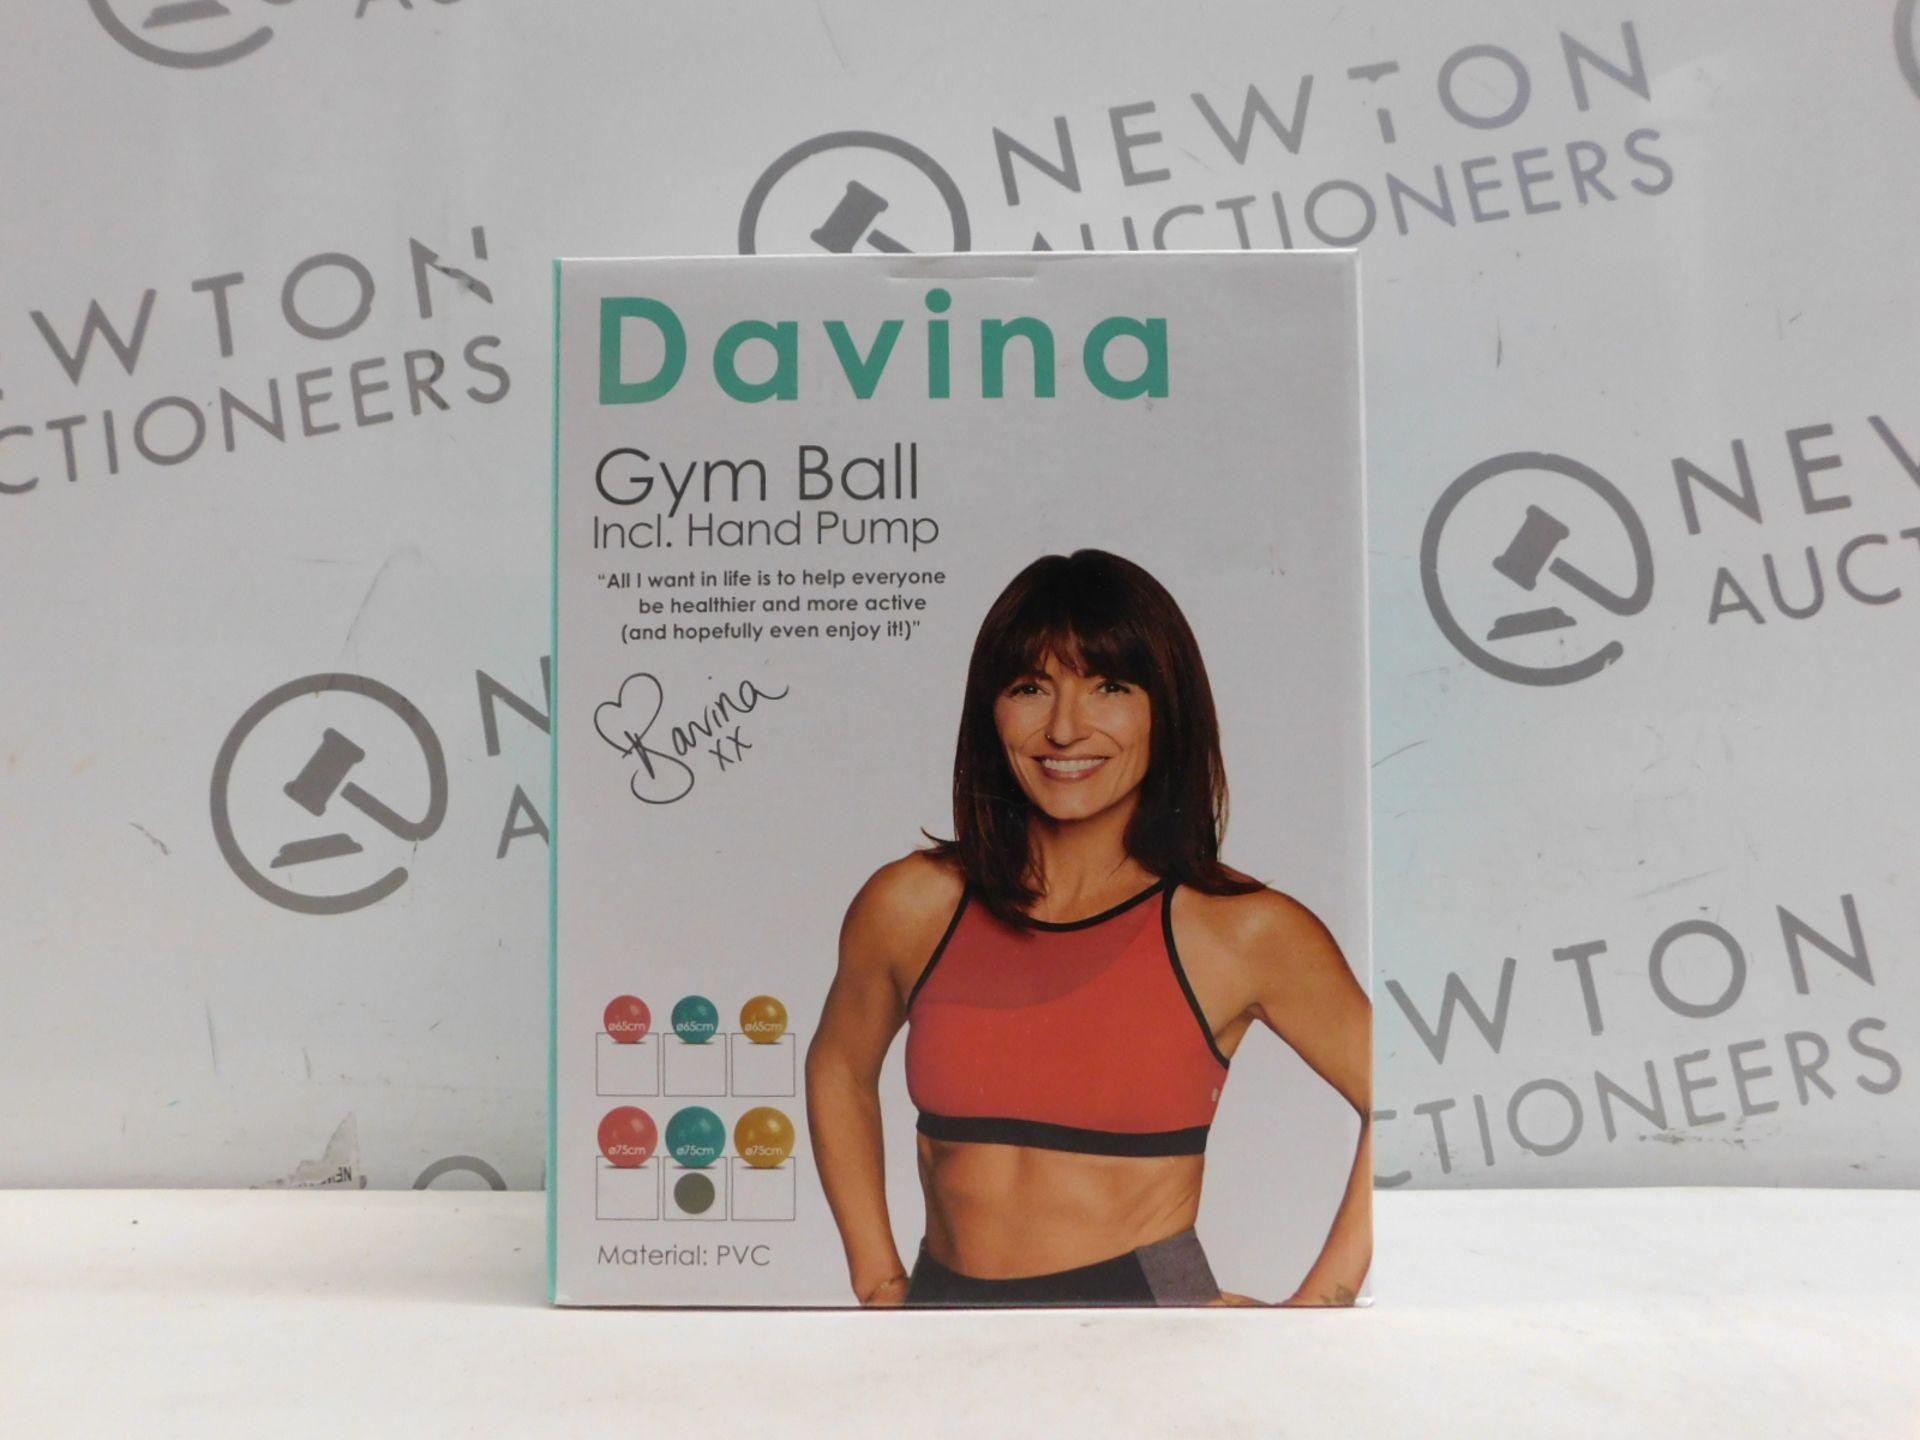 1 BRAND NEW BOXED DAVINA GYM BALL RRP £19